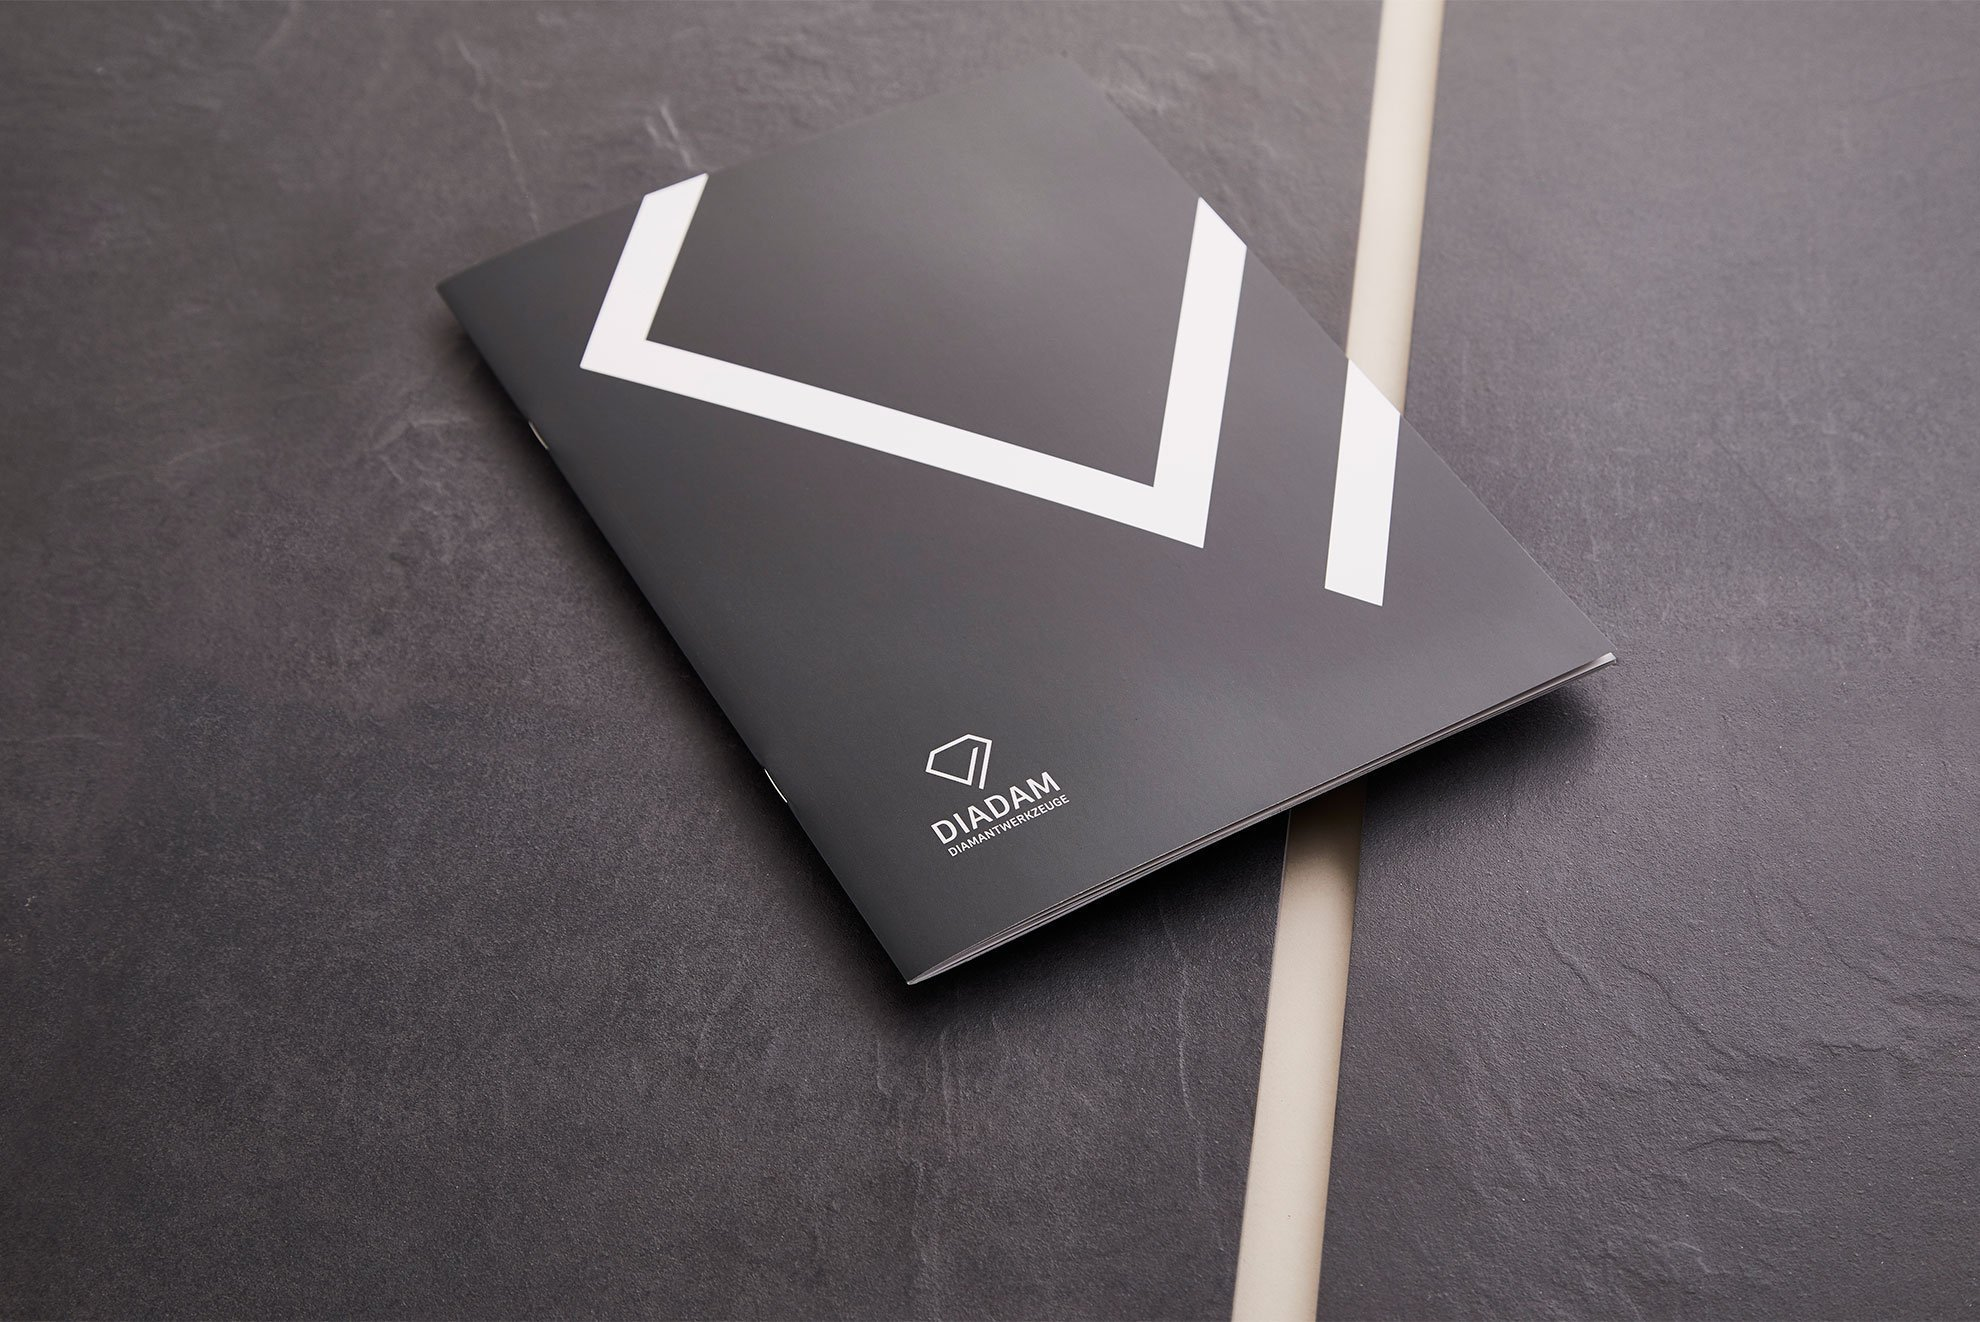 Imageboschüre - Diadam Corporate Design und Webdesign